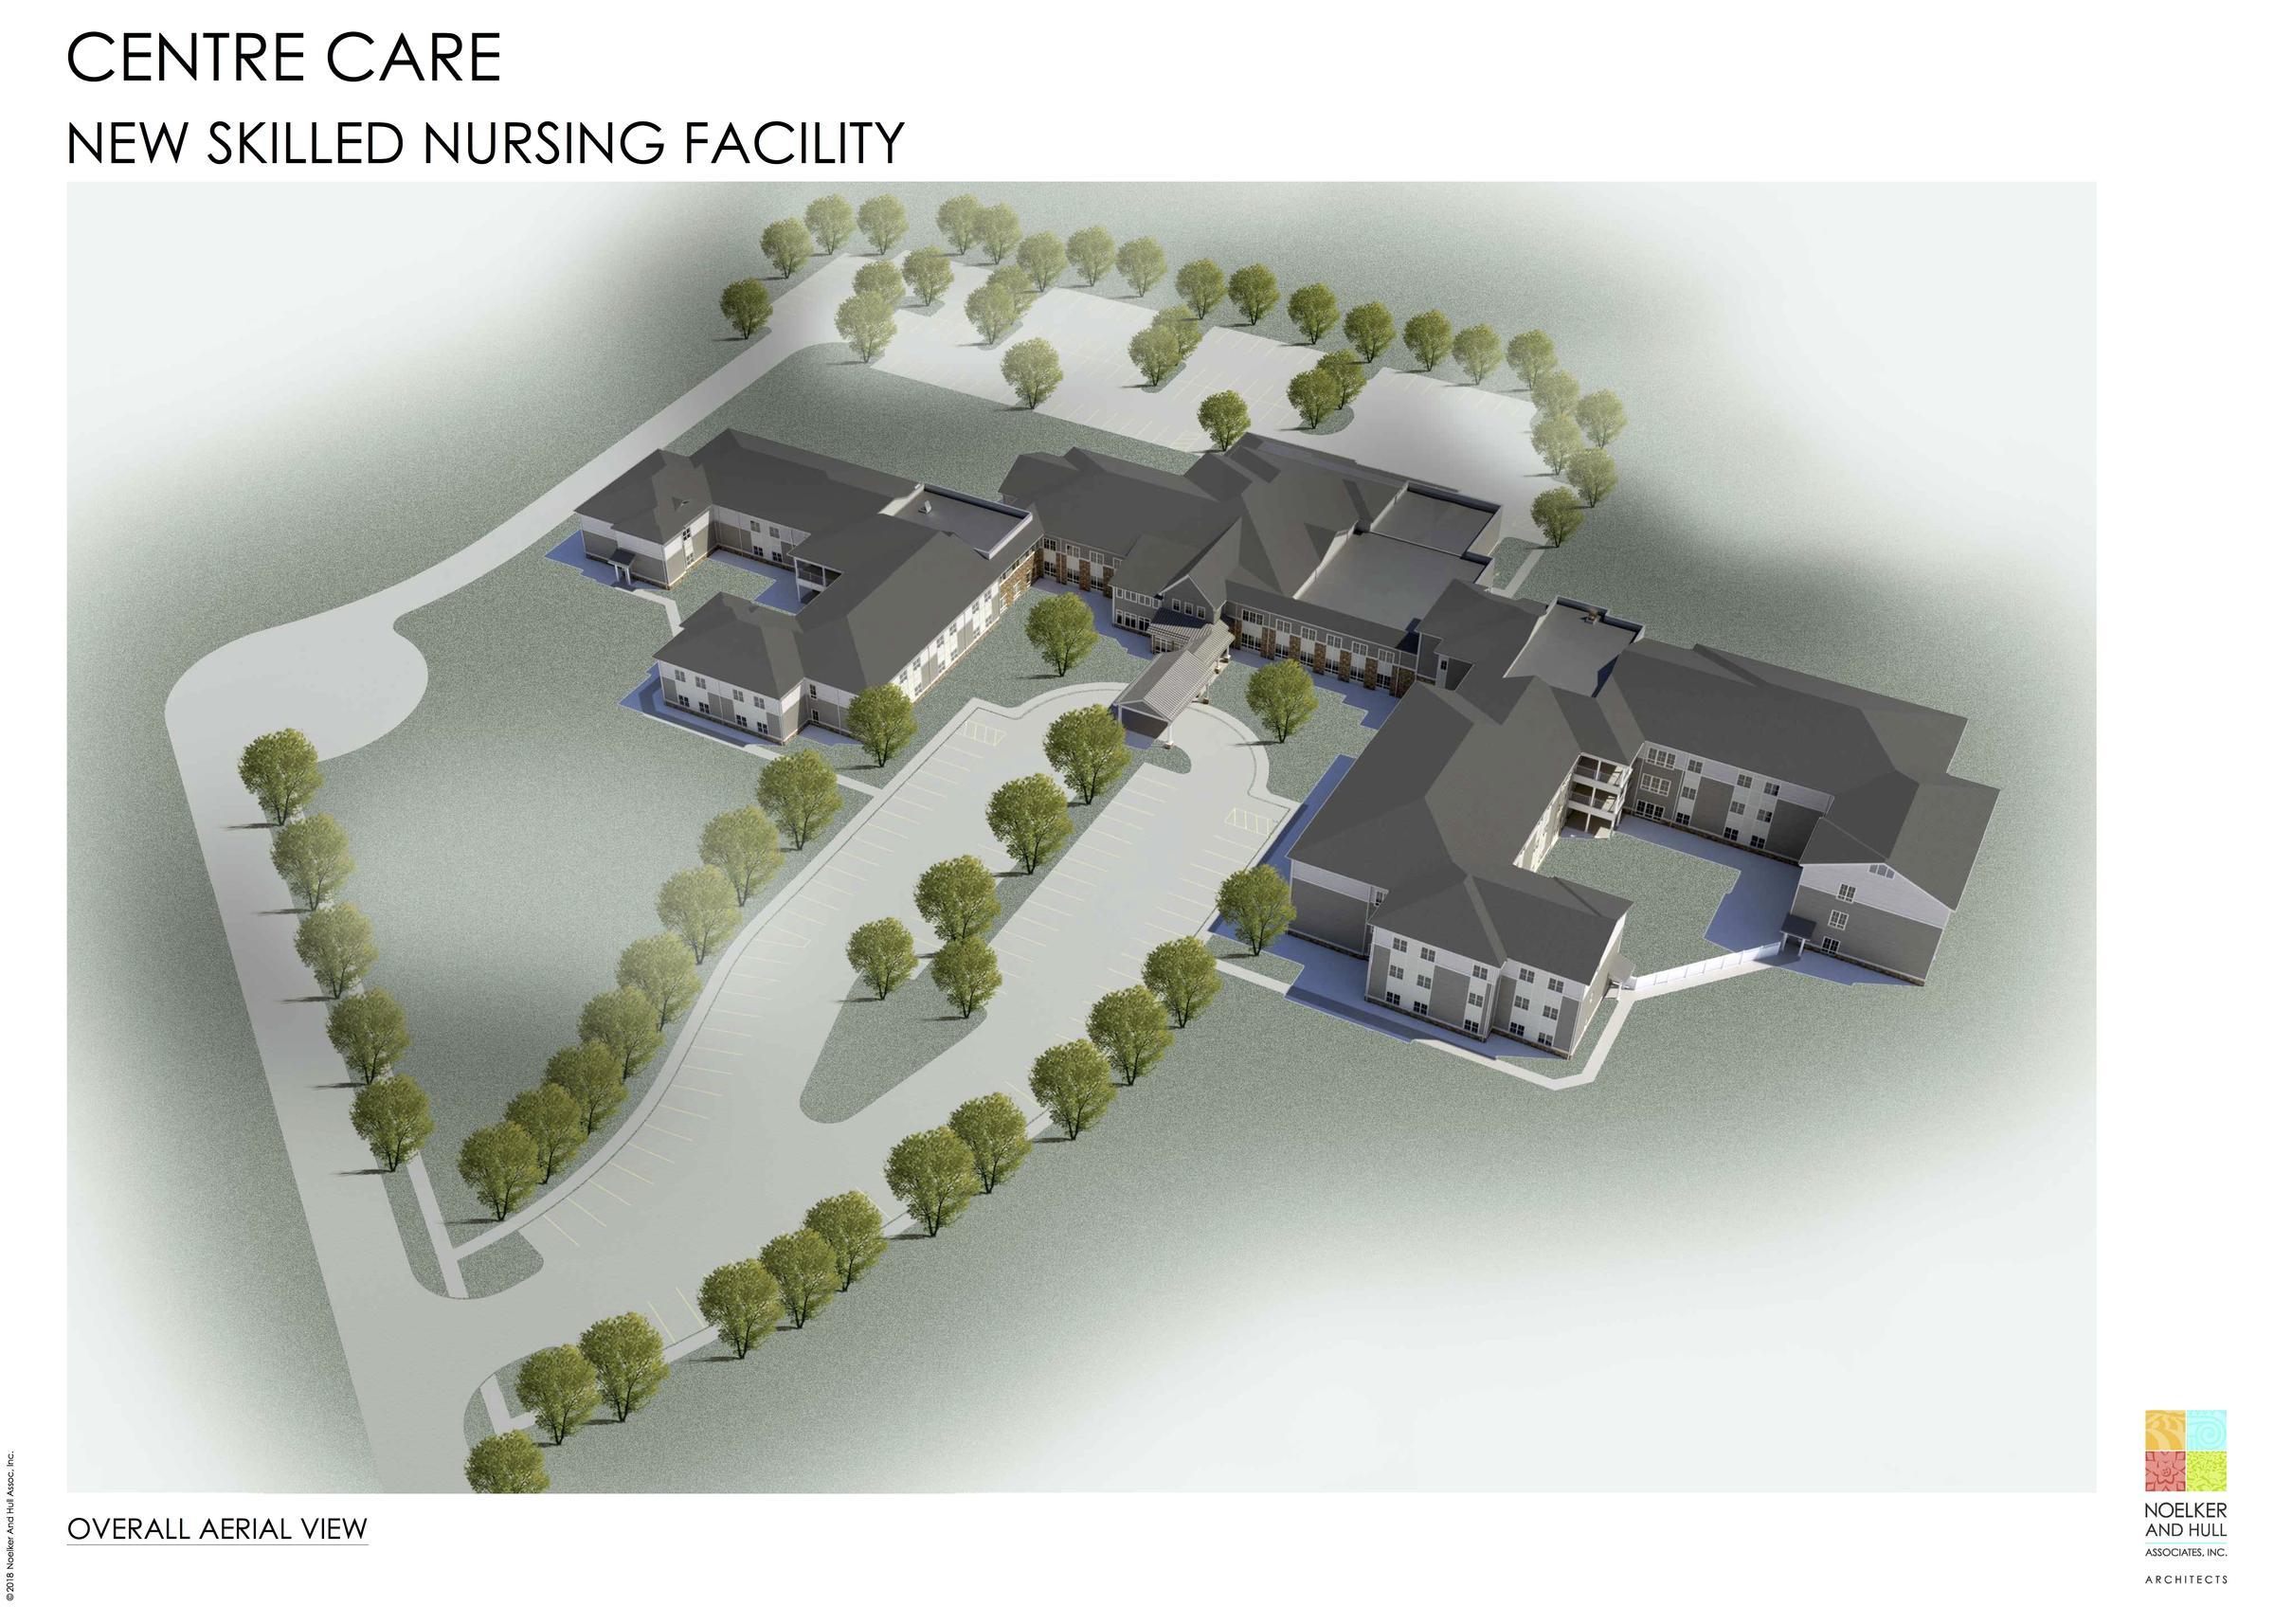 Groundbreaking For New Centre Crest Nursing Home Slated ... on greenhouse model nursing home, wall art for nursing home, wagon wheel design plans nursing home,